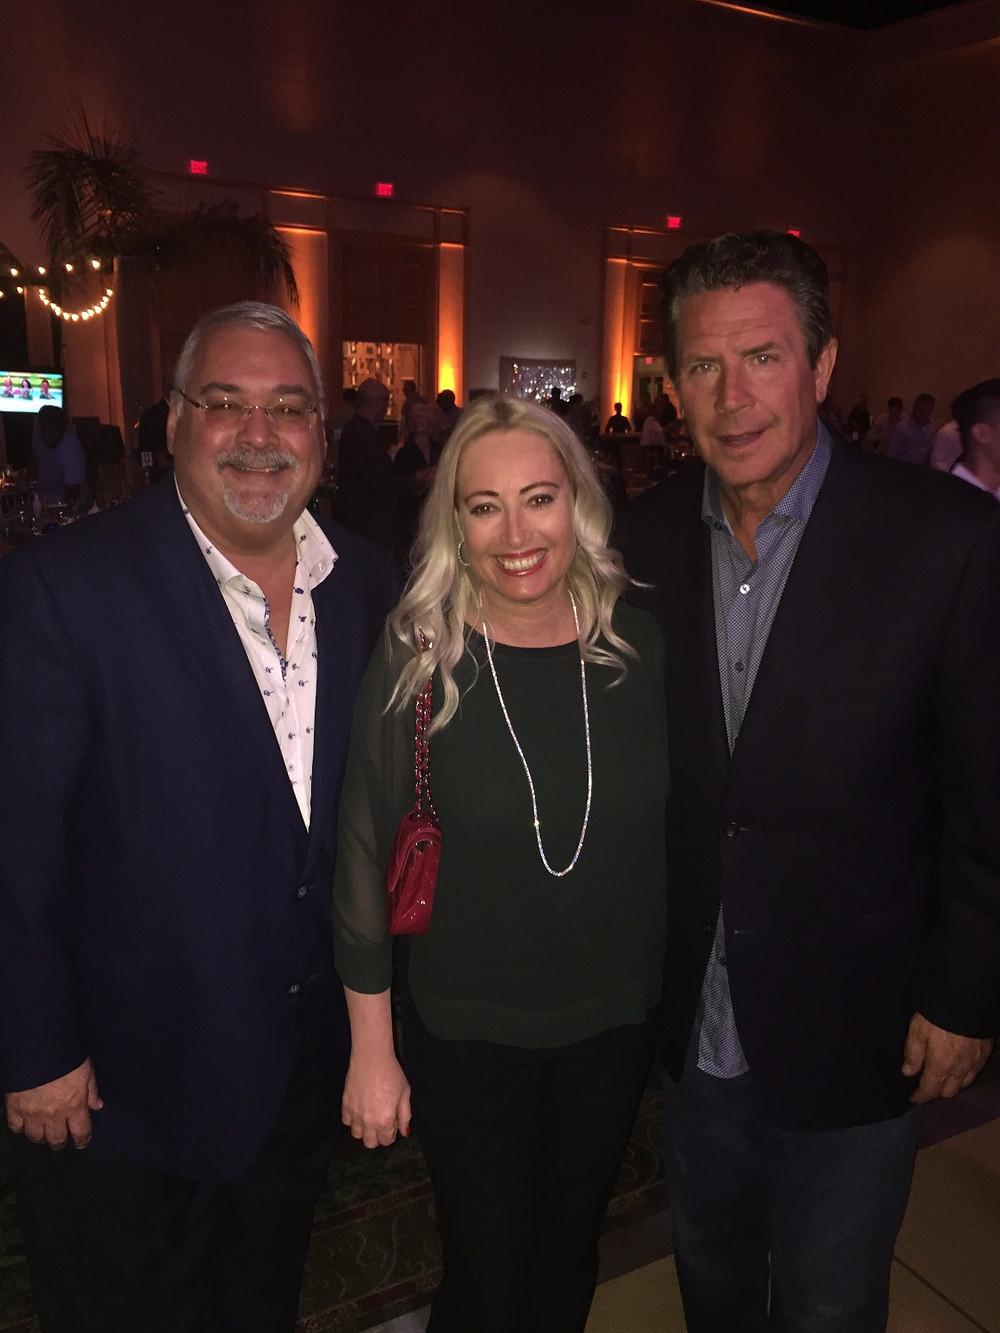 John Brunetti Jr., Adina Brunetti and Dan Marino